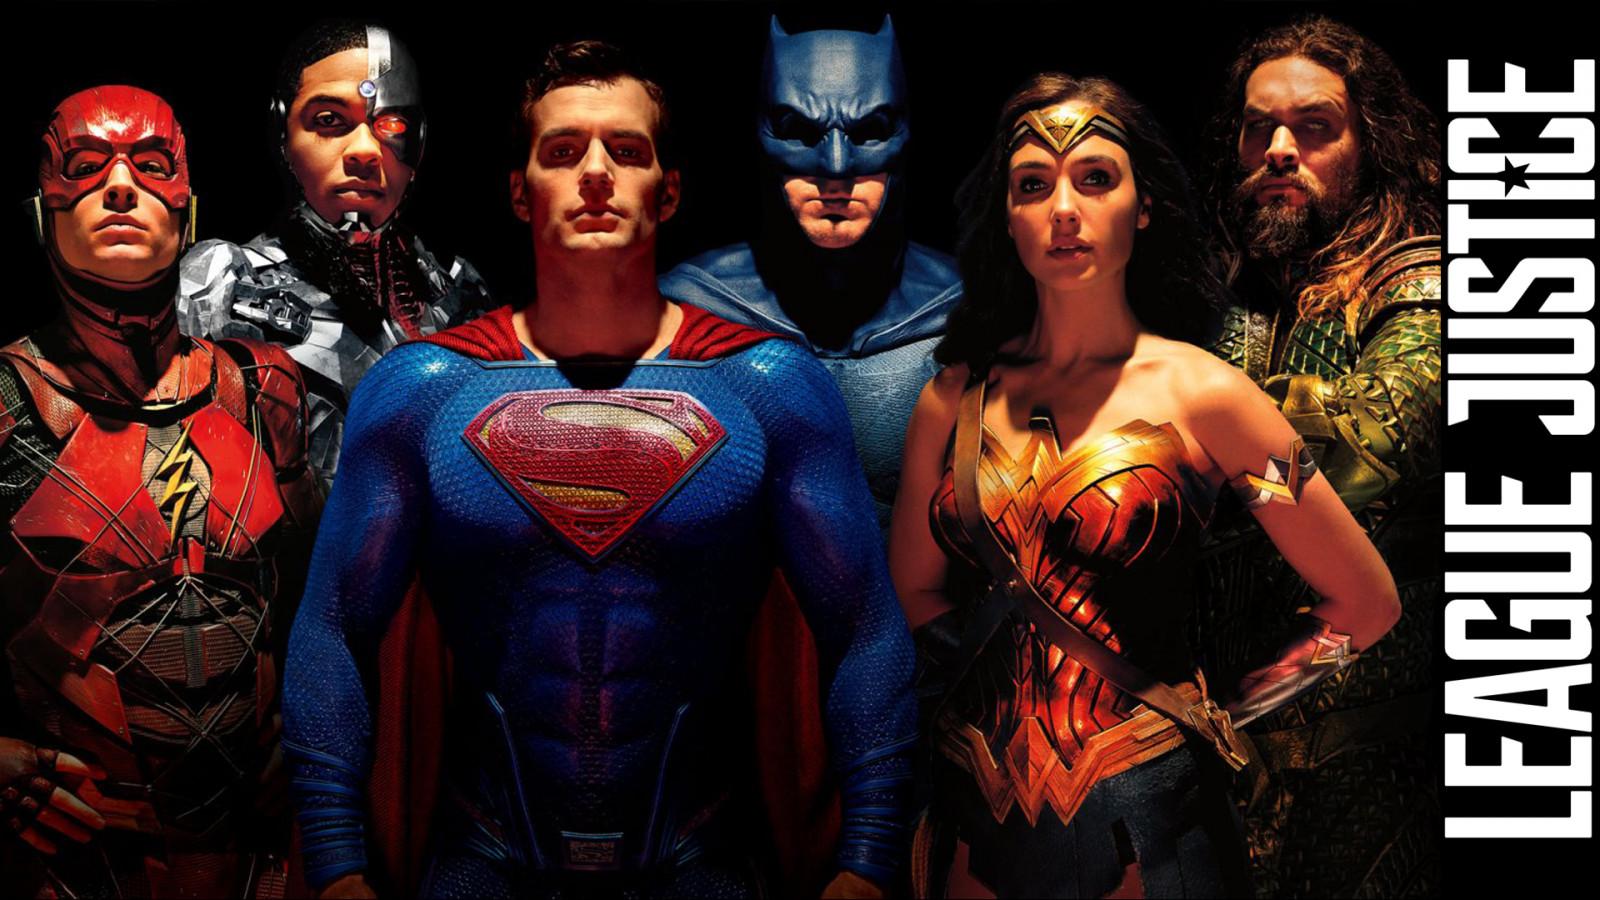 Wallpaper Justice League 2017 Movies Flash Superman: Wallpaper : Justice League 2017, Batman V Superman Dawn Of